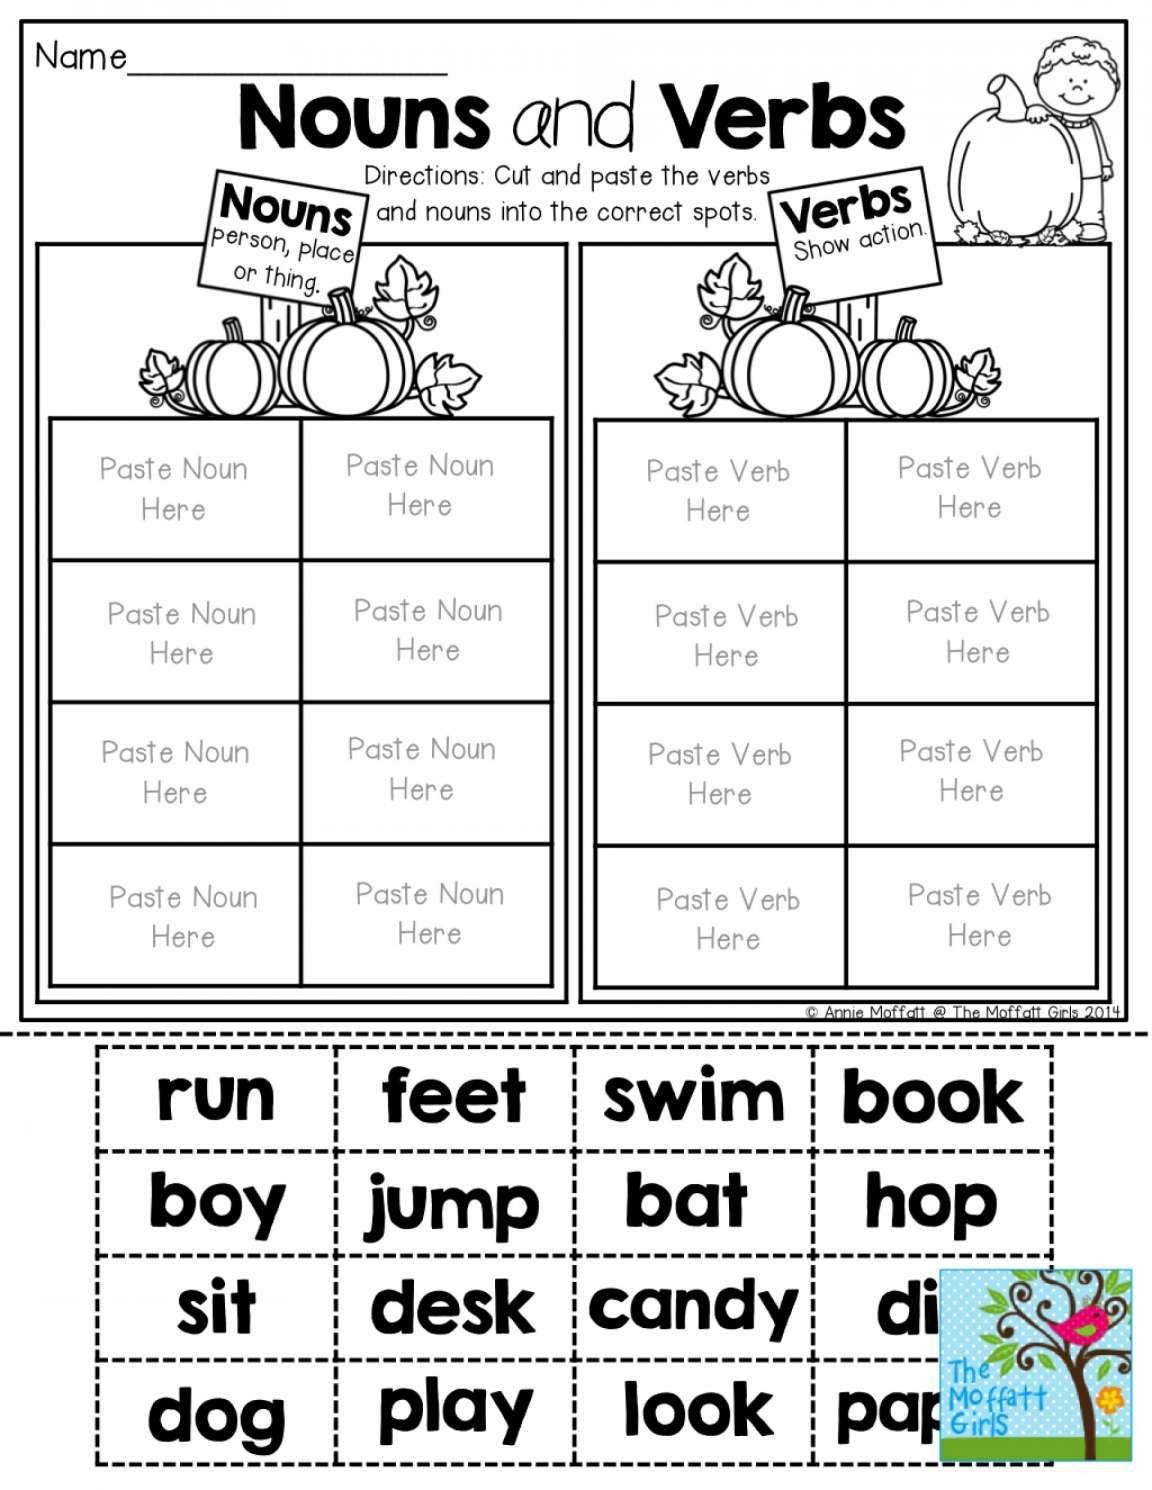 Nouns and Verbs Worksheet Pin On English